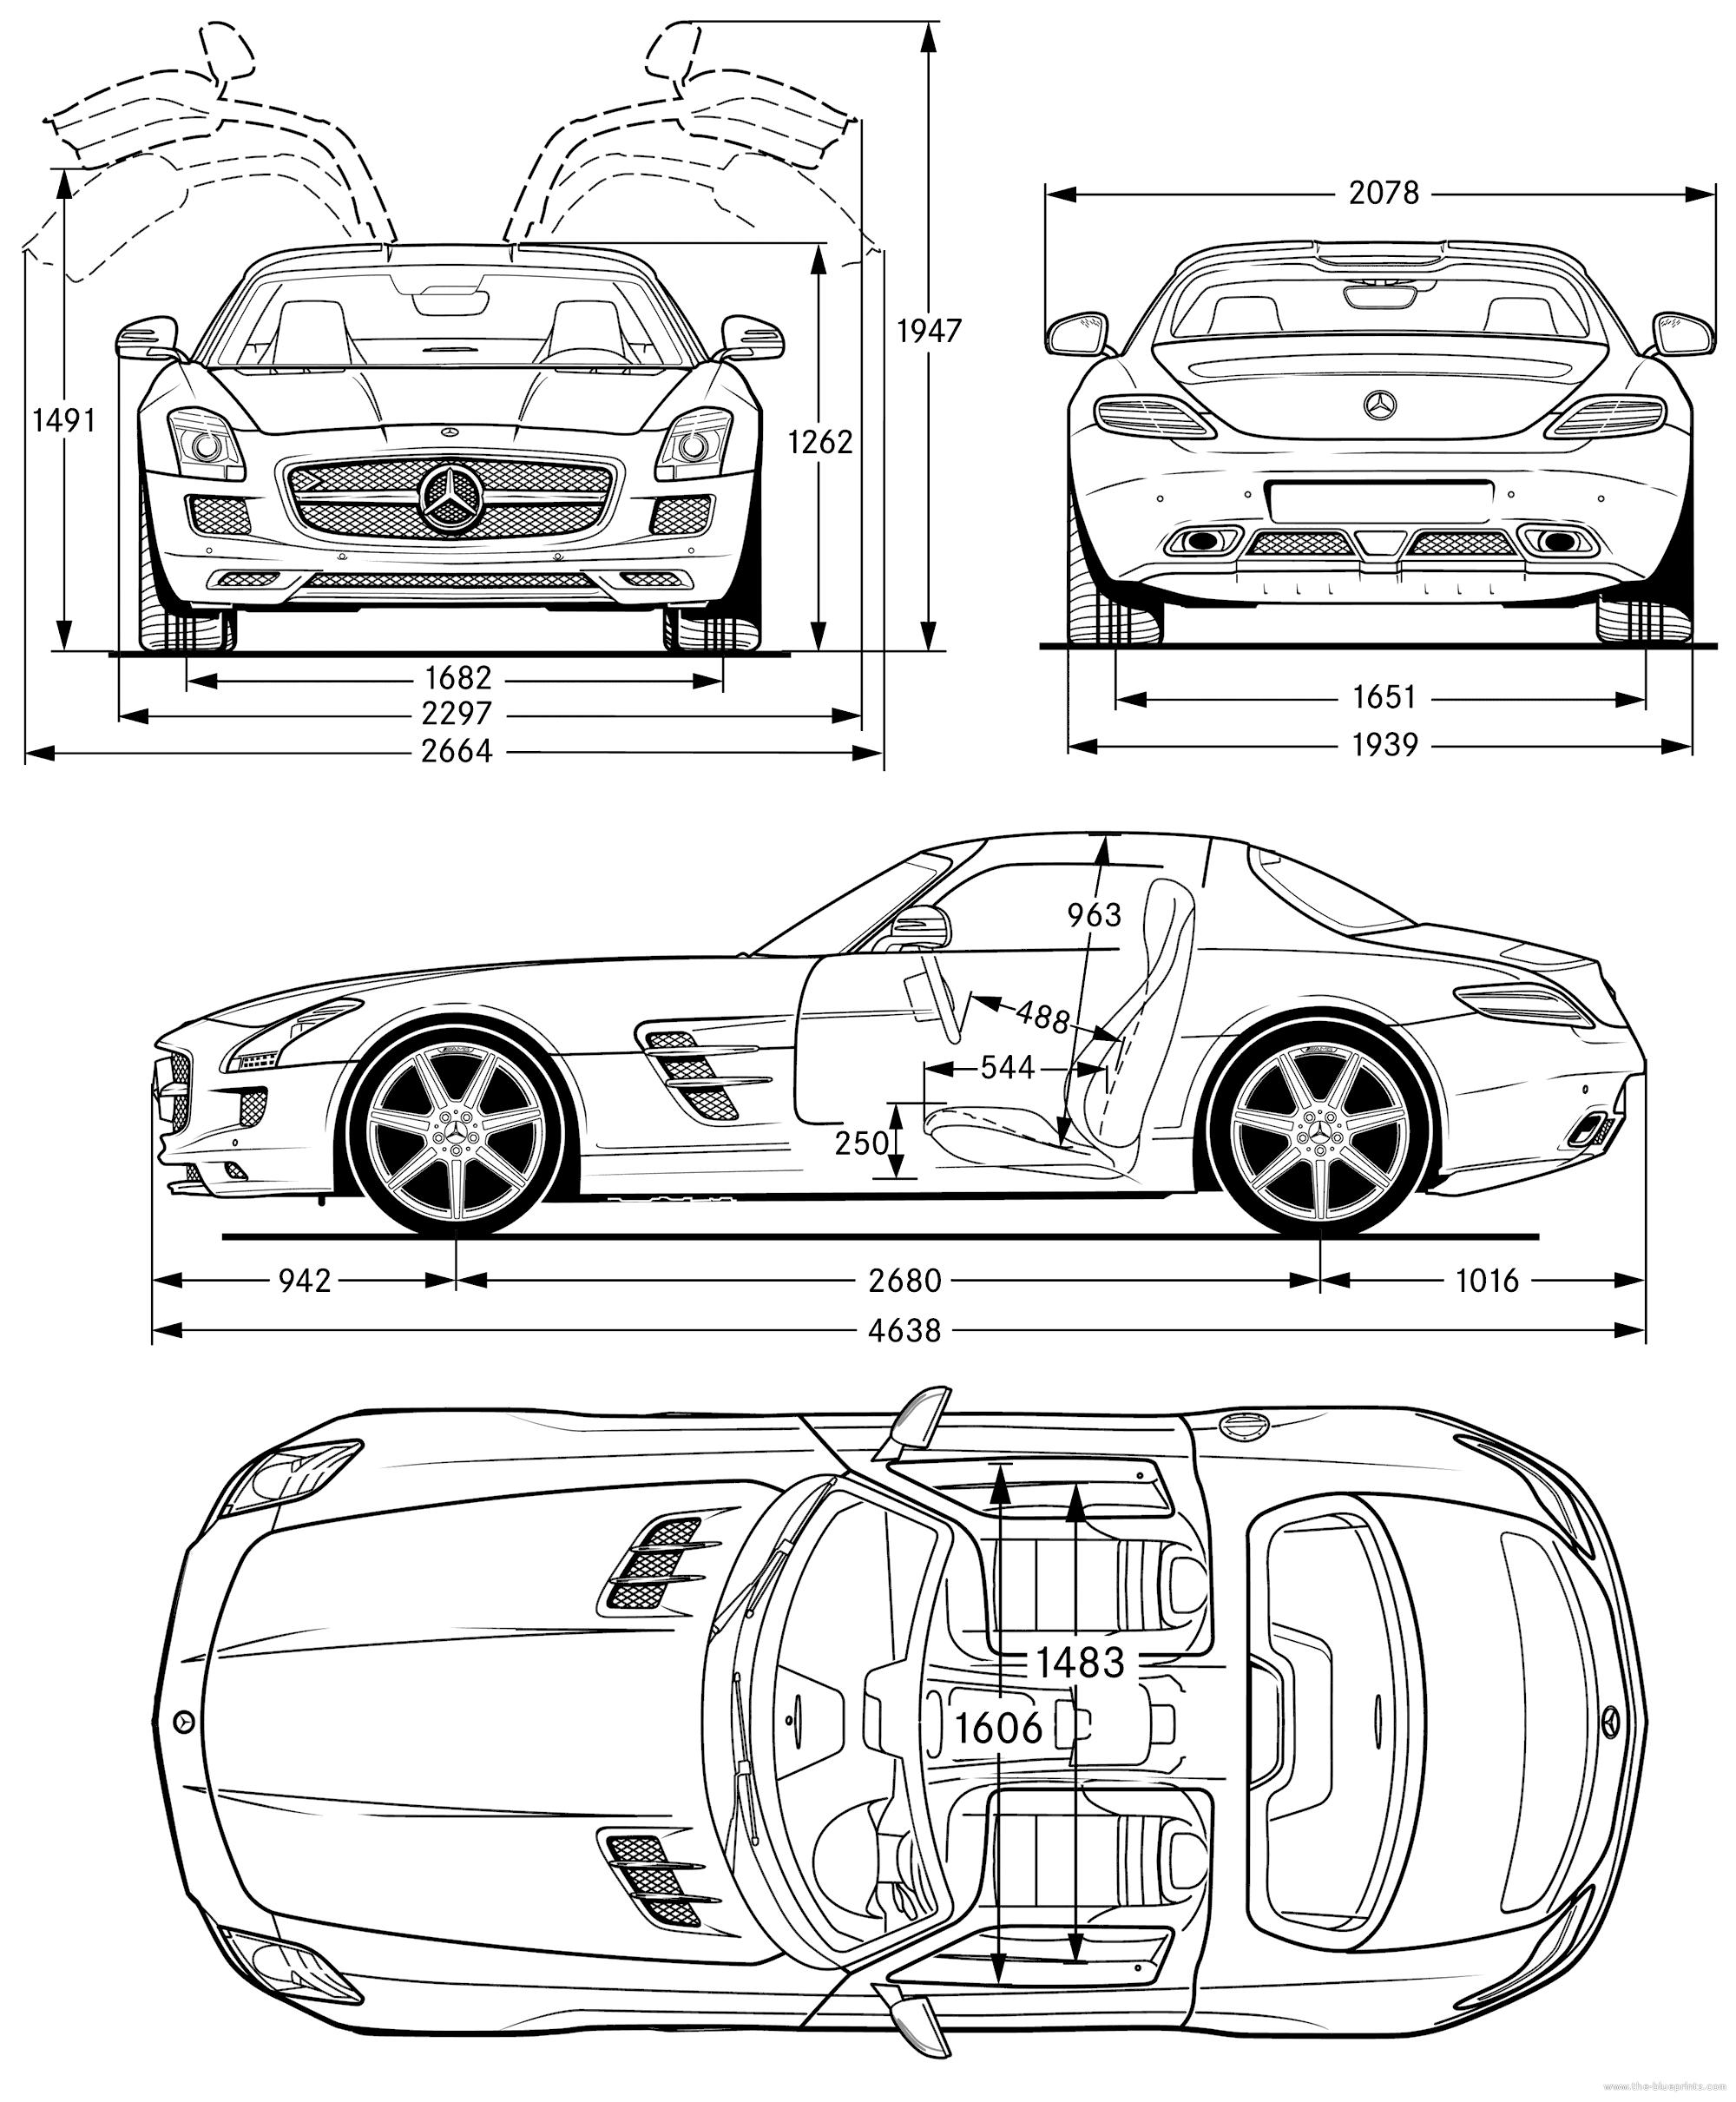 Pin De The Original Article Em Cars